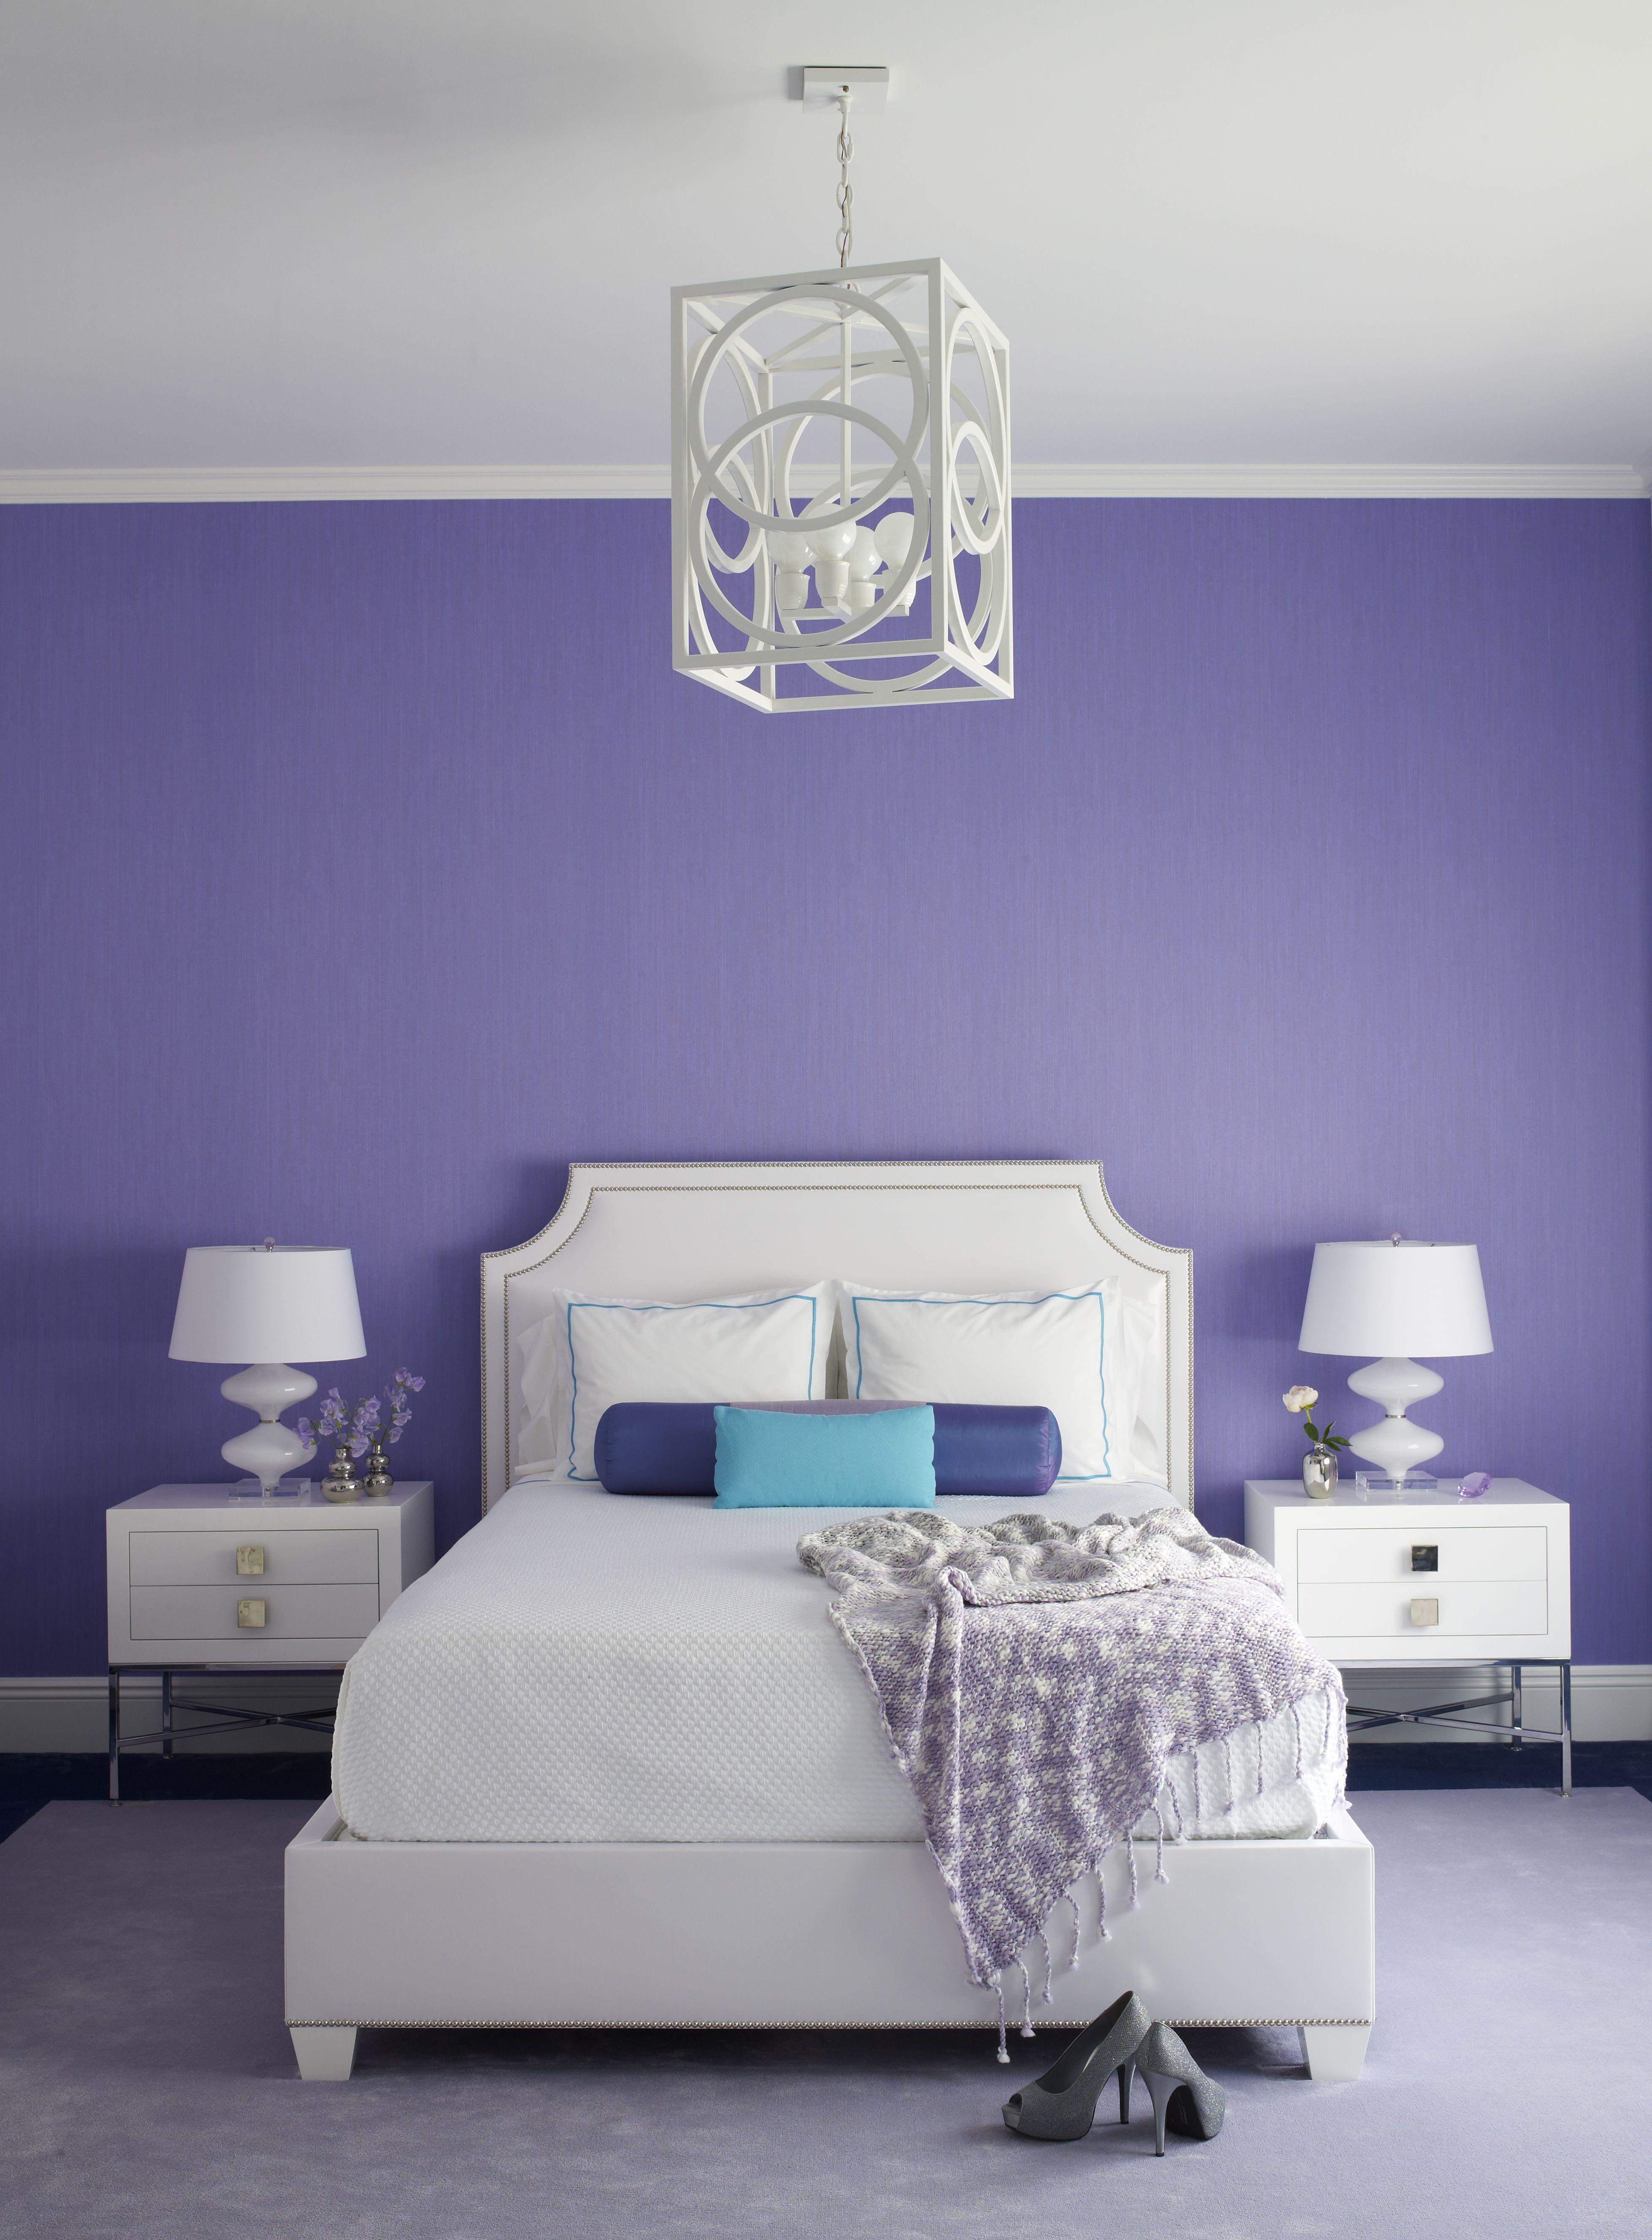 Bedroom Park Avenue Combination in New York